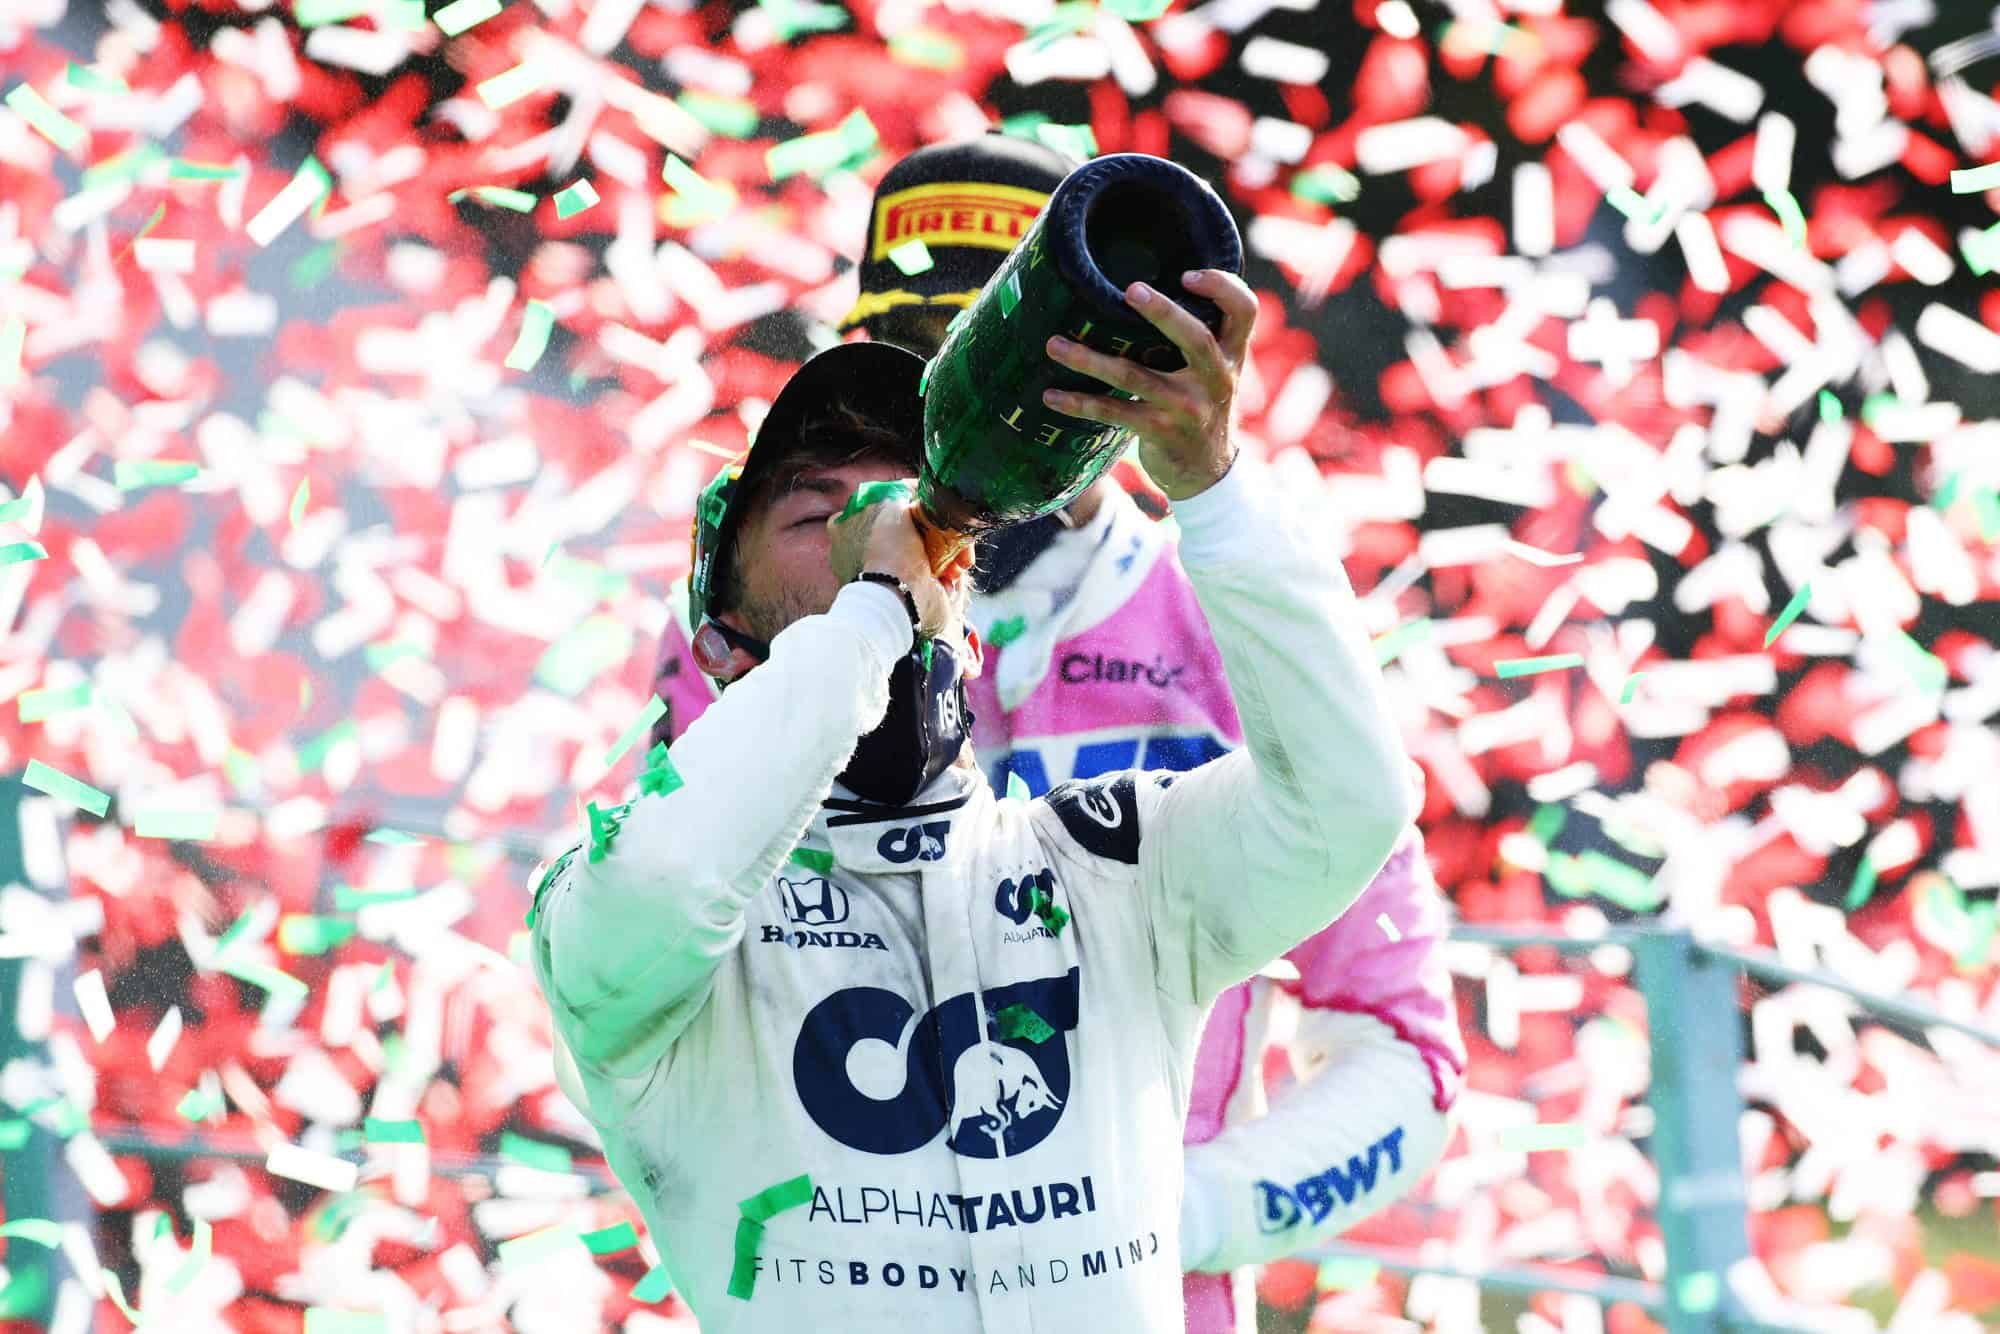 2020 Italian GP Gasly AlphaTauri podium celebration champagne Photo AlphaTauri Red Bull